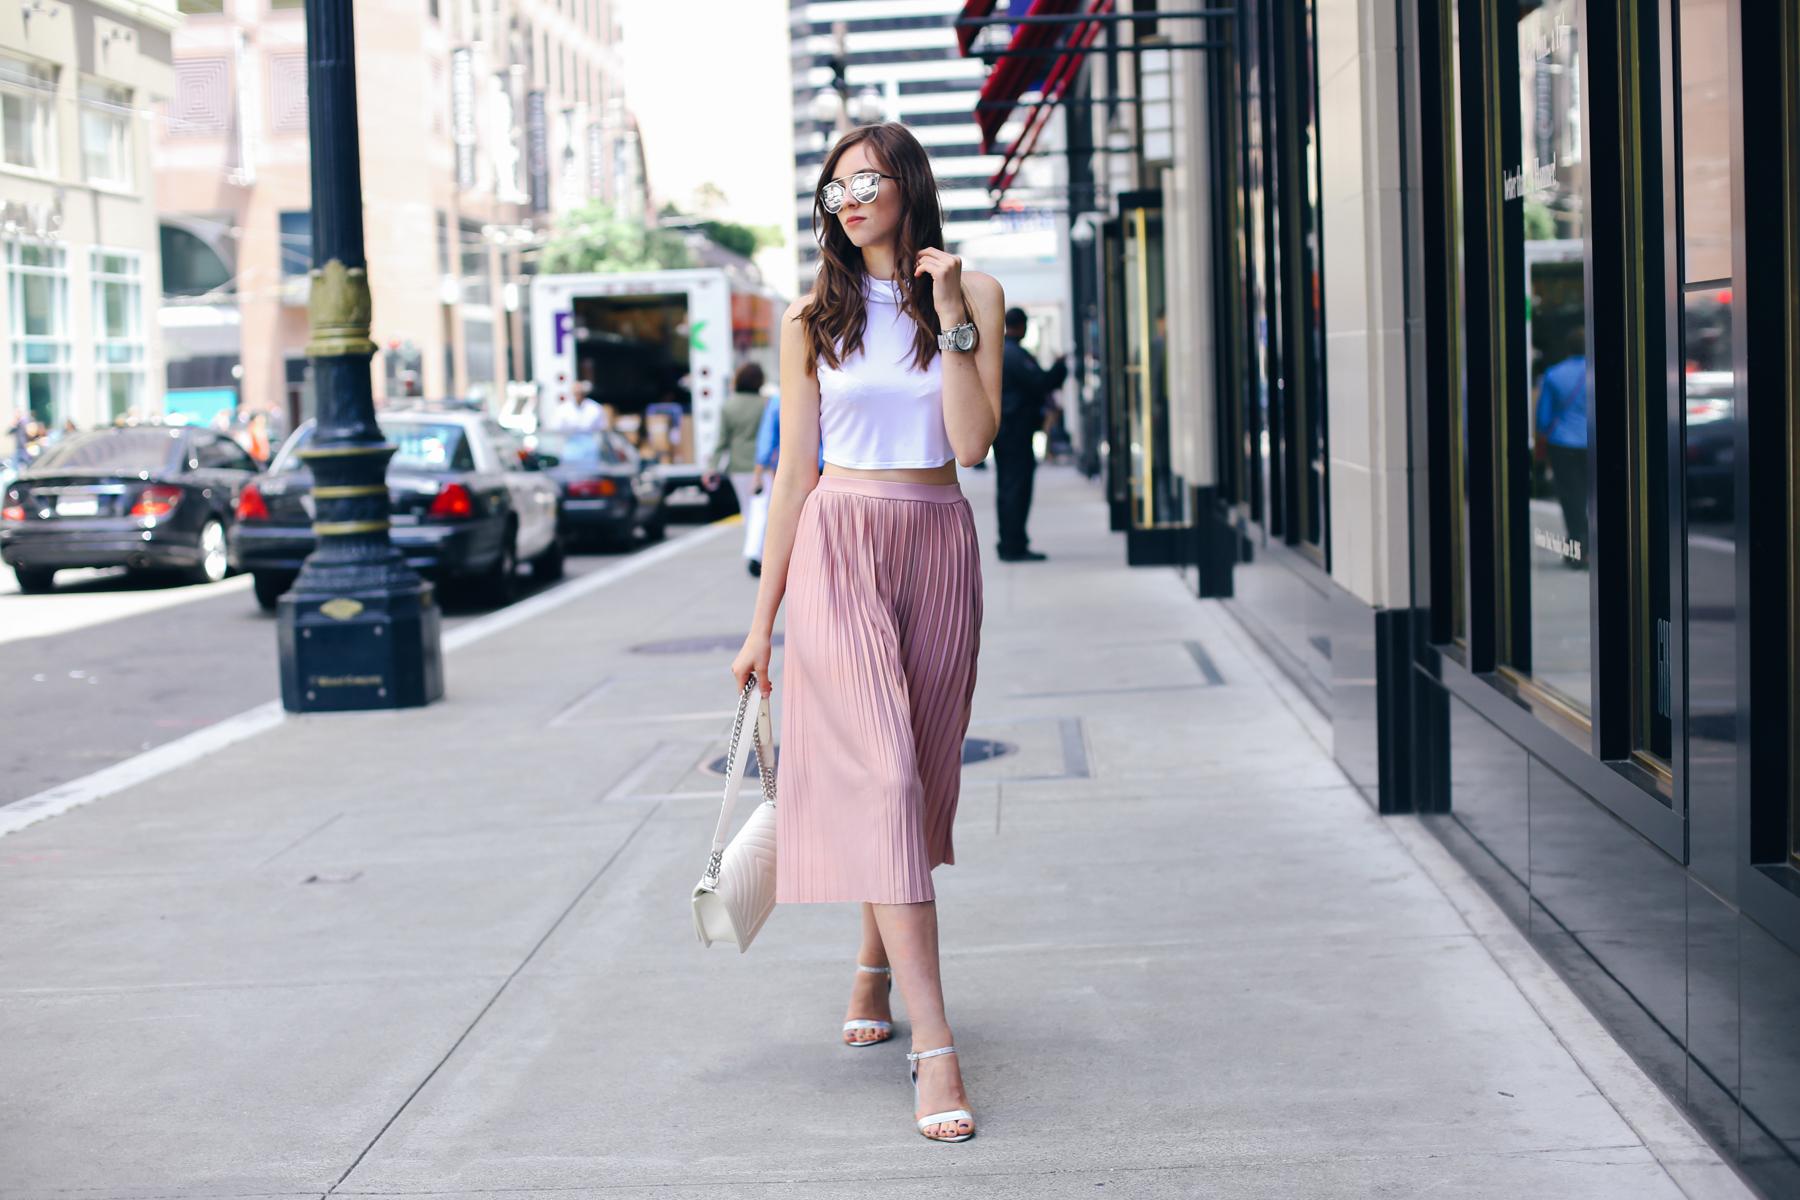 Barbora-Ondracova-FashioninmySoul-Fashion-Blogger-Photography-RyanbyRyanChua-7511